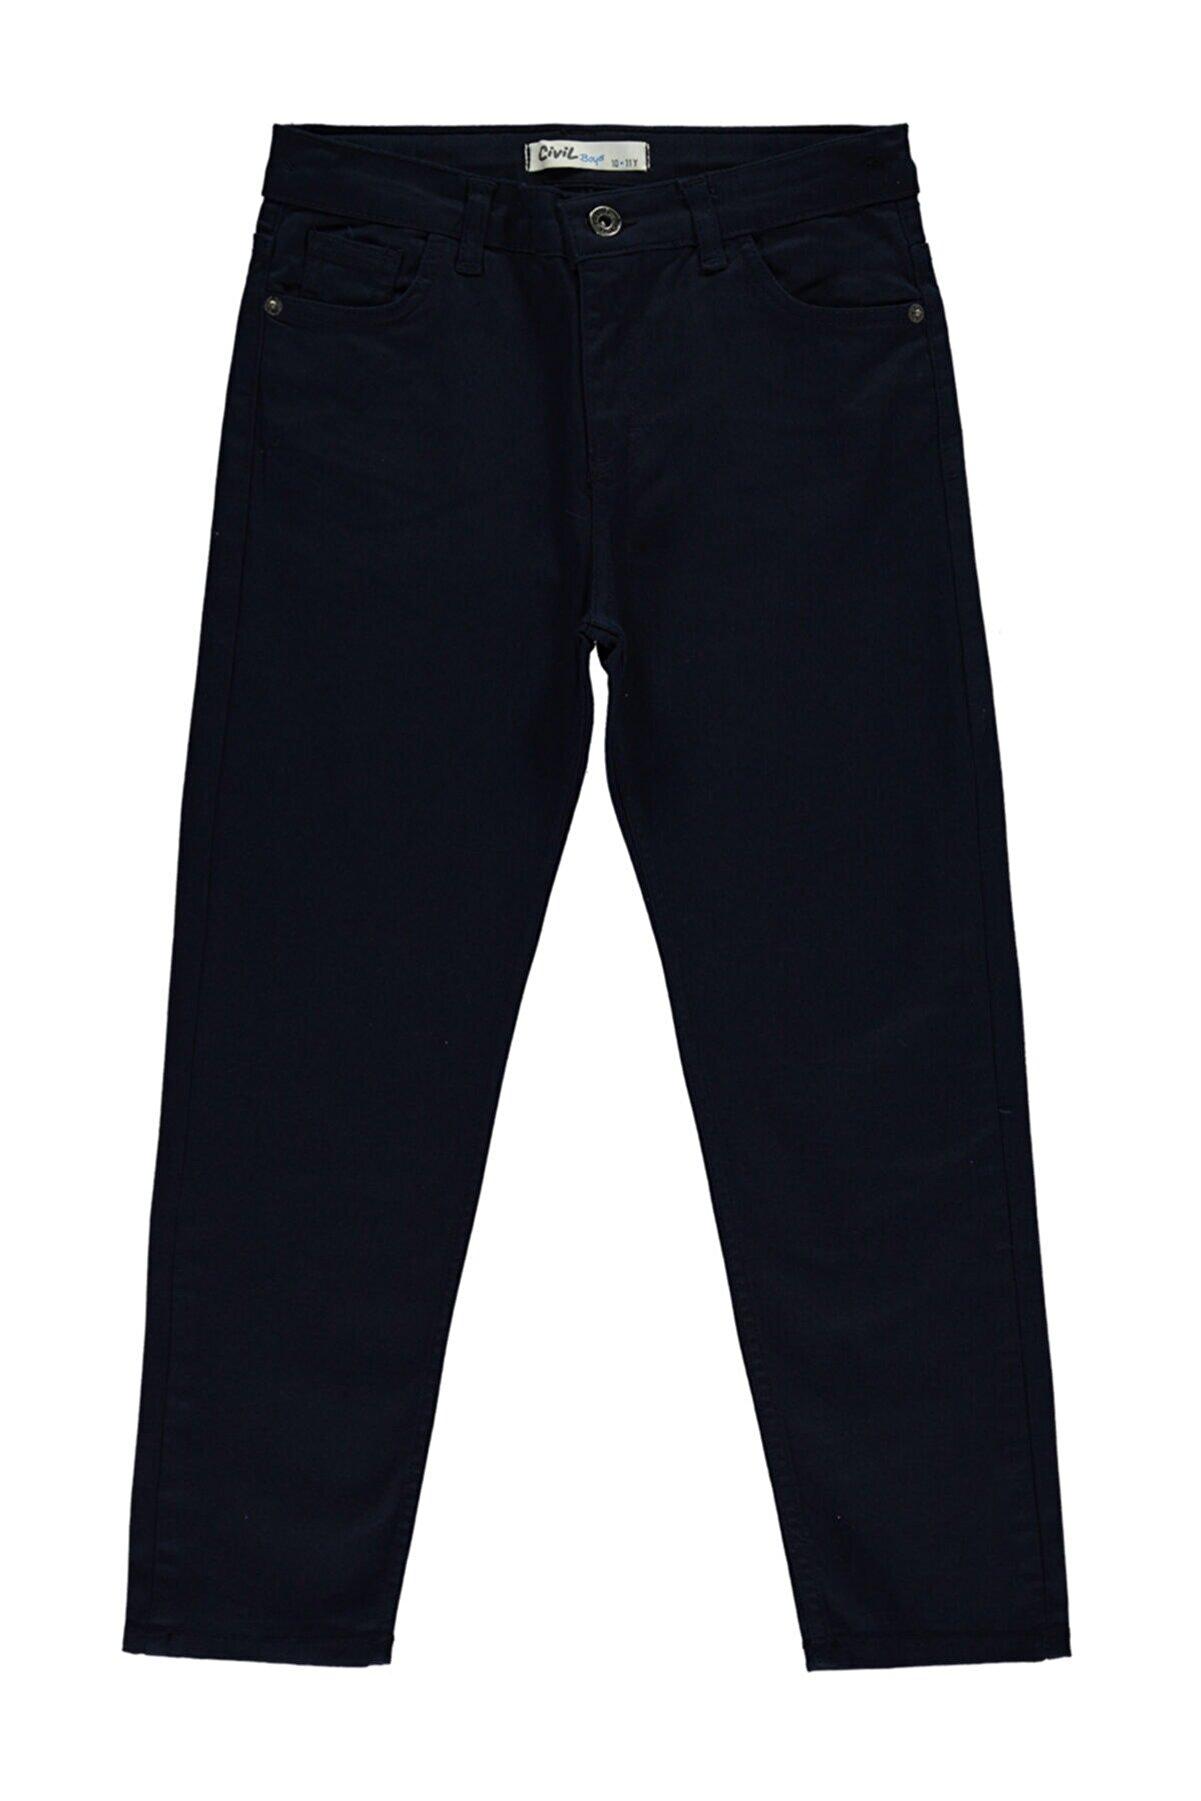 Civil Boys Erkek Çocuk Pantolon Lacivert